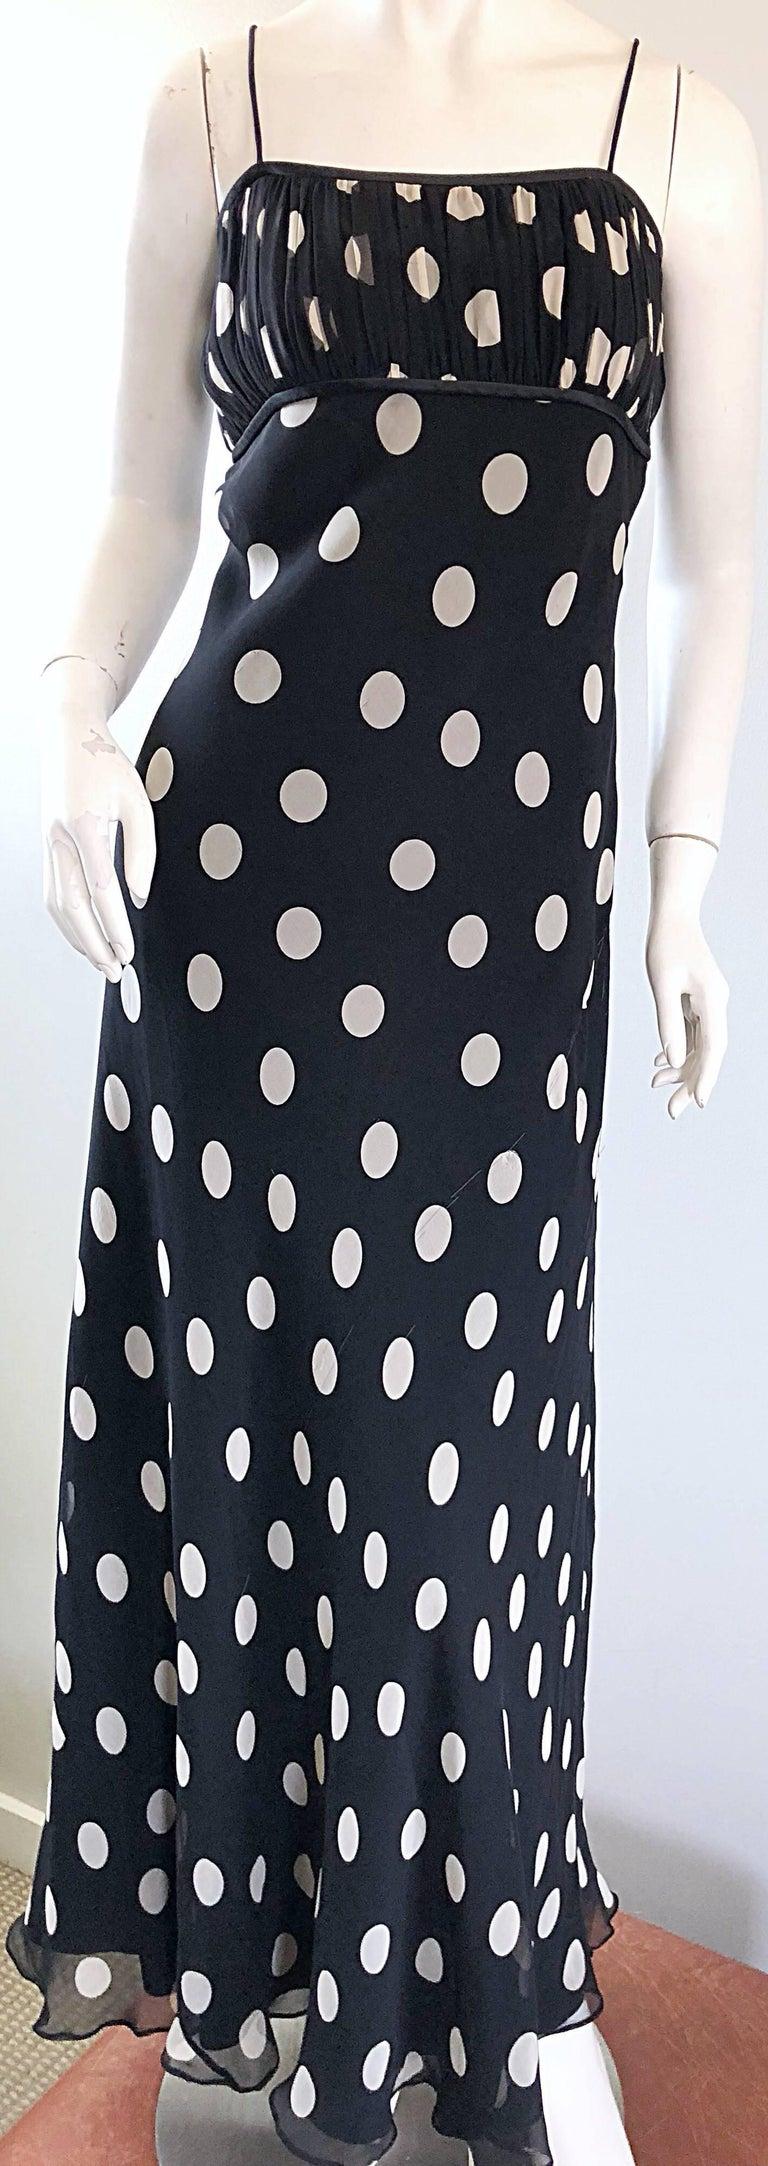 1990s Abriele Melano Black and White Polka Dot Silk Chiffon Maxi Dress 90s Gown For Sale 5